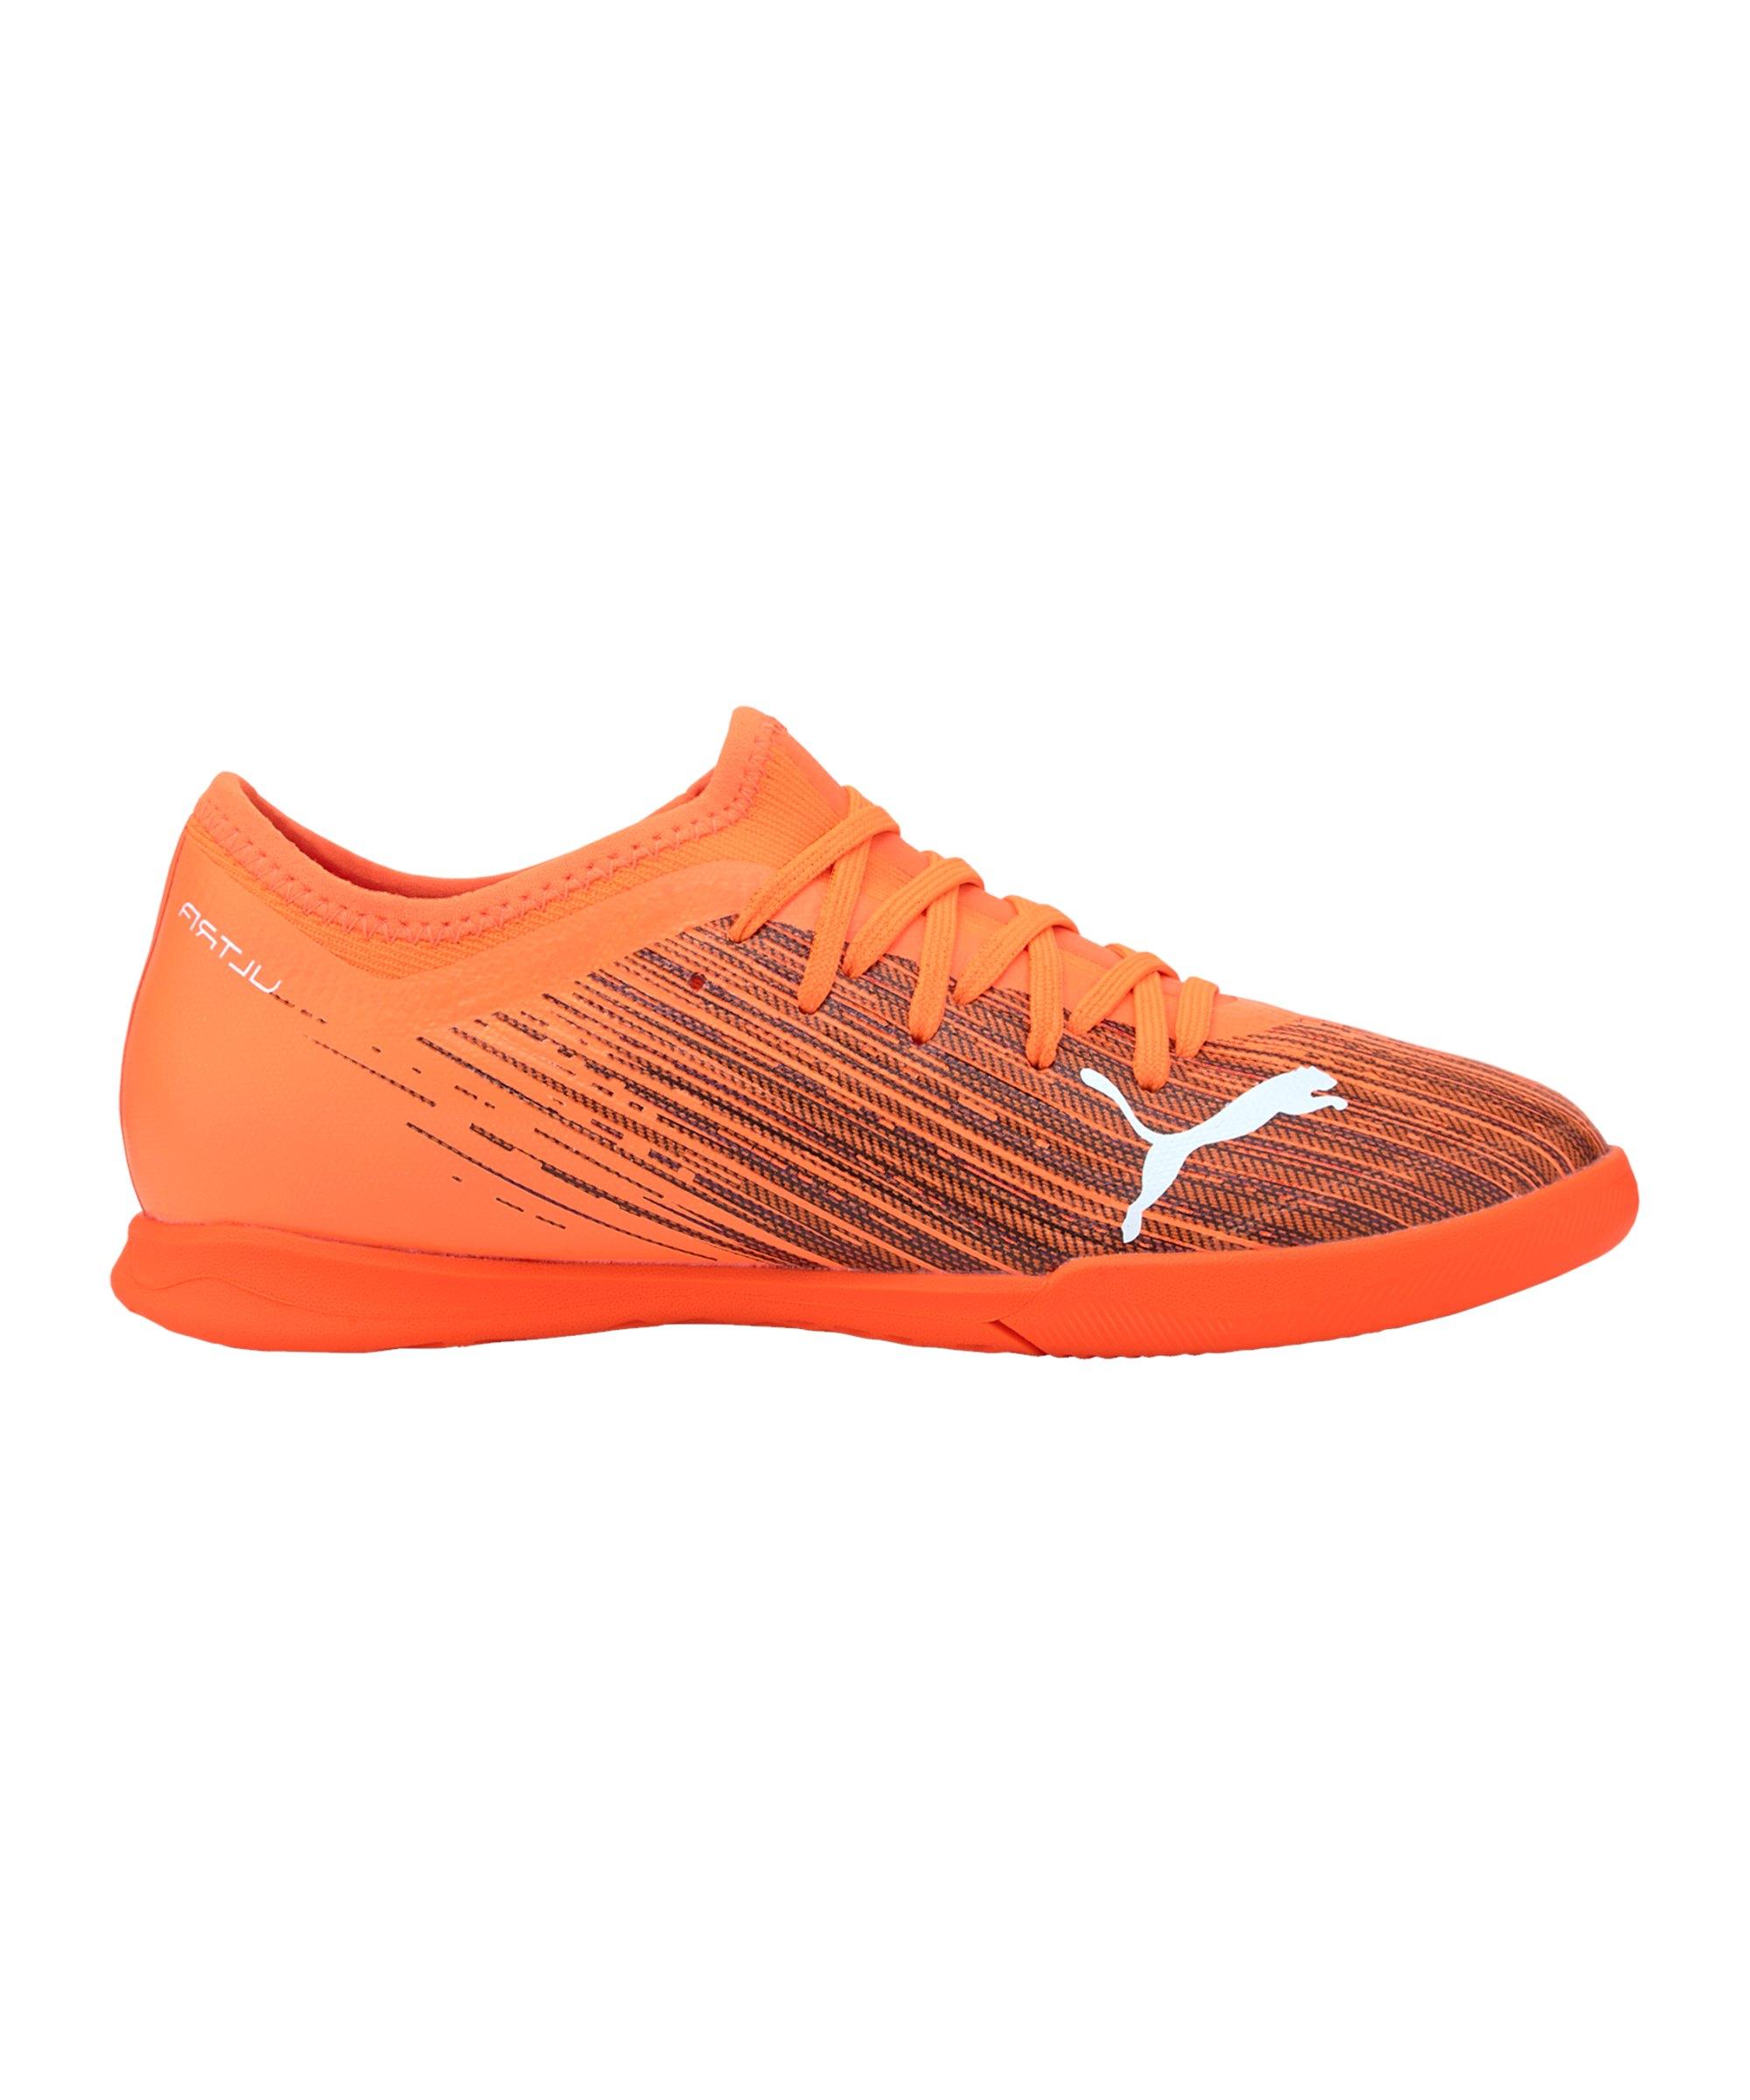 PUMA ULTRA Chasing Adrenaline 3.1 IT Halle Kids Orange F01 - orange